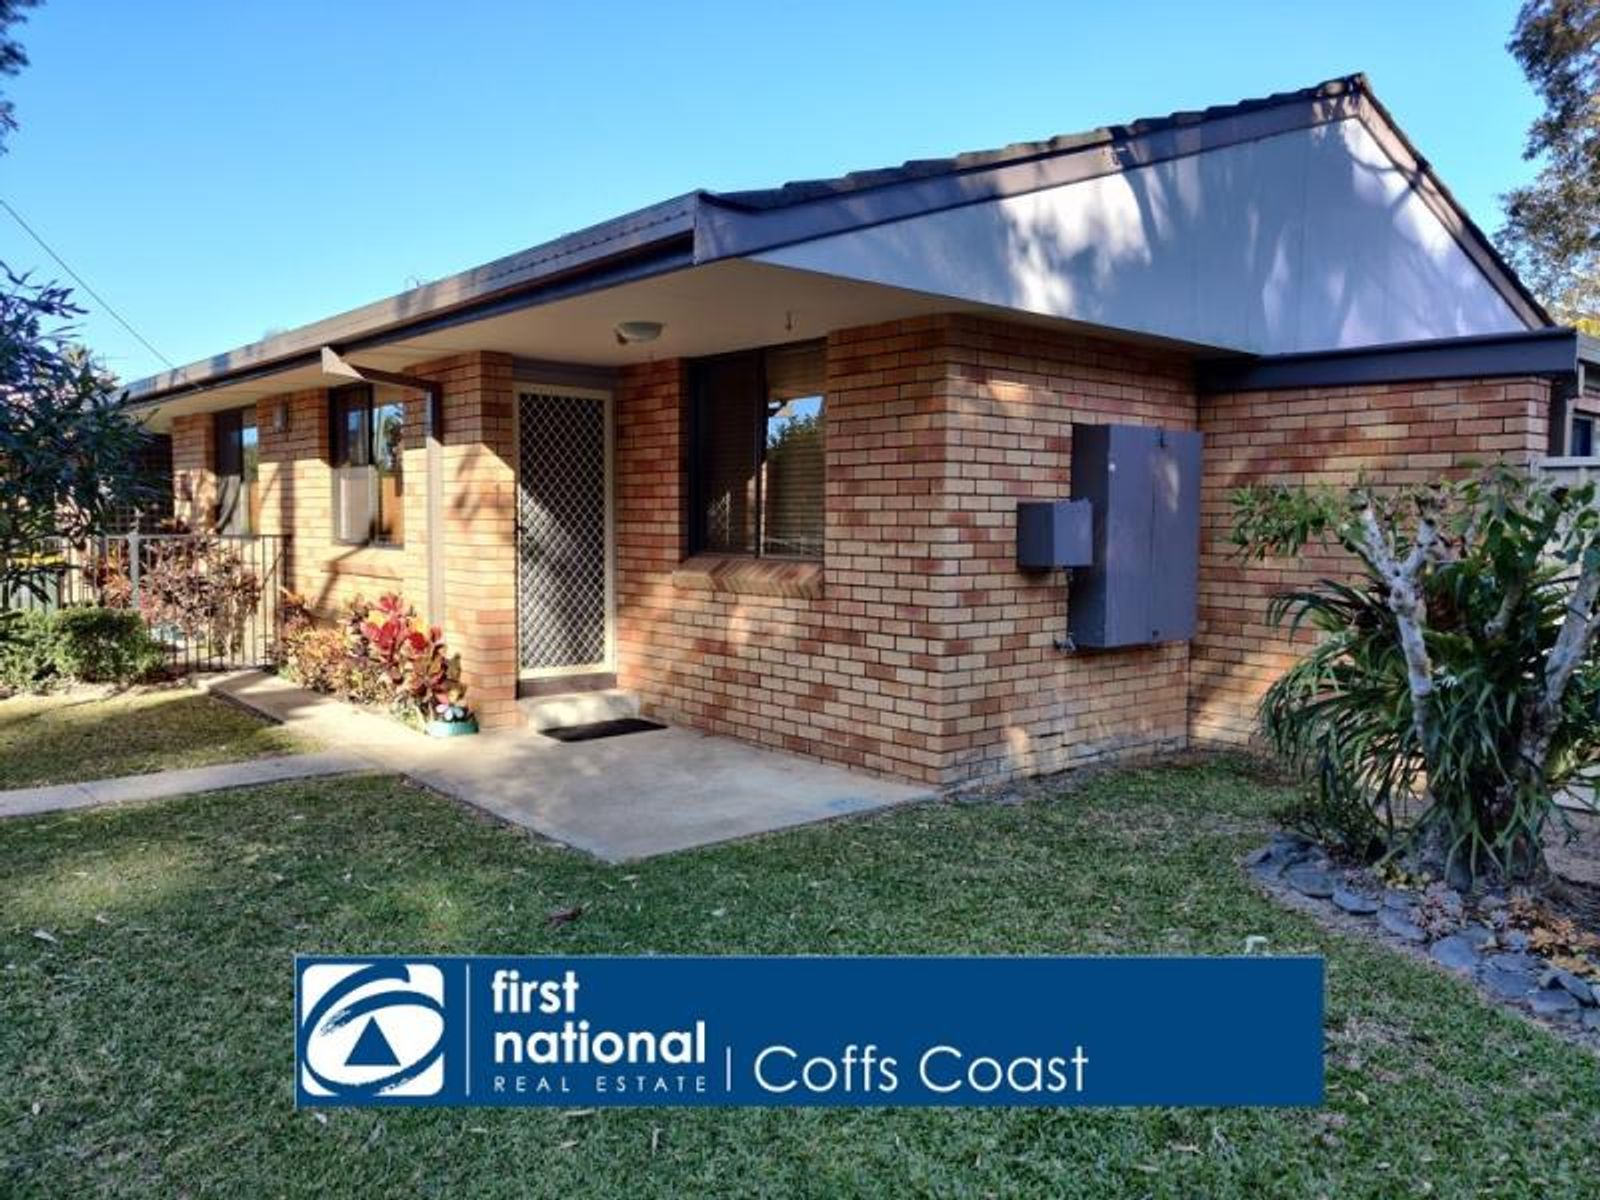 4/73 Boultwood Street, Coffs Harbour, NSW 2450